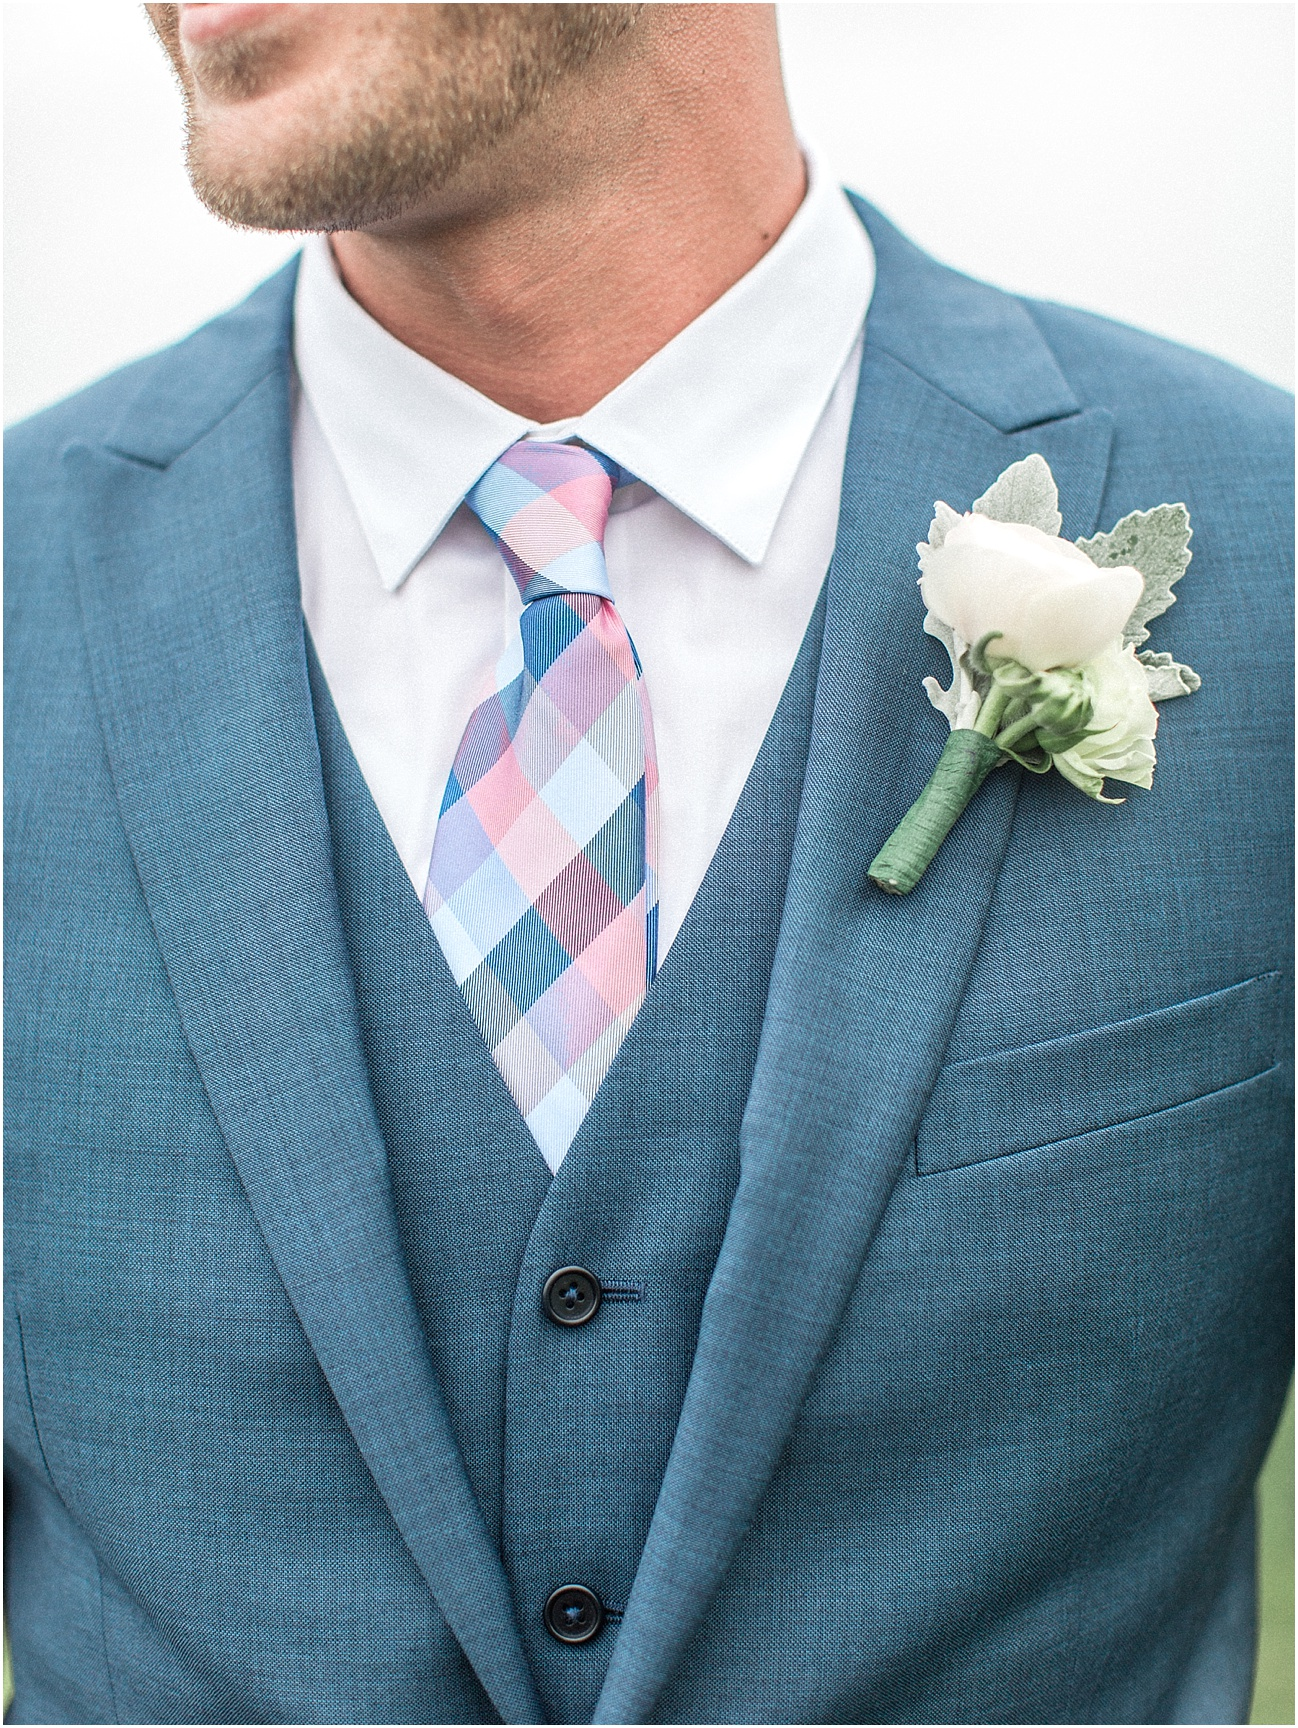 kati_bryan_maskell_white_cliffs_country_club_cape_cod_boston_wedding_photographer_meredith_jane_photography_photo_0493.jpg